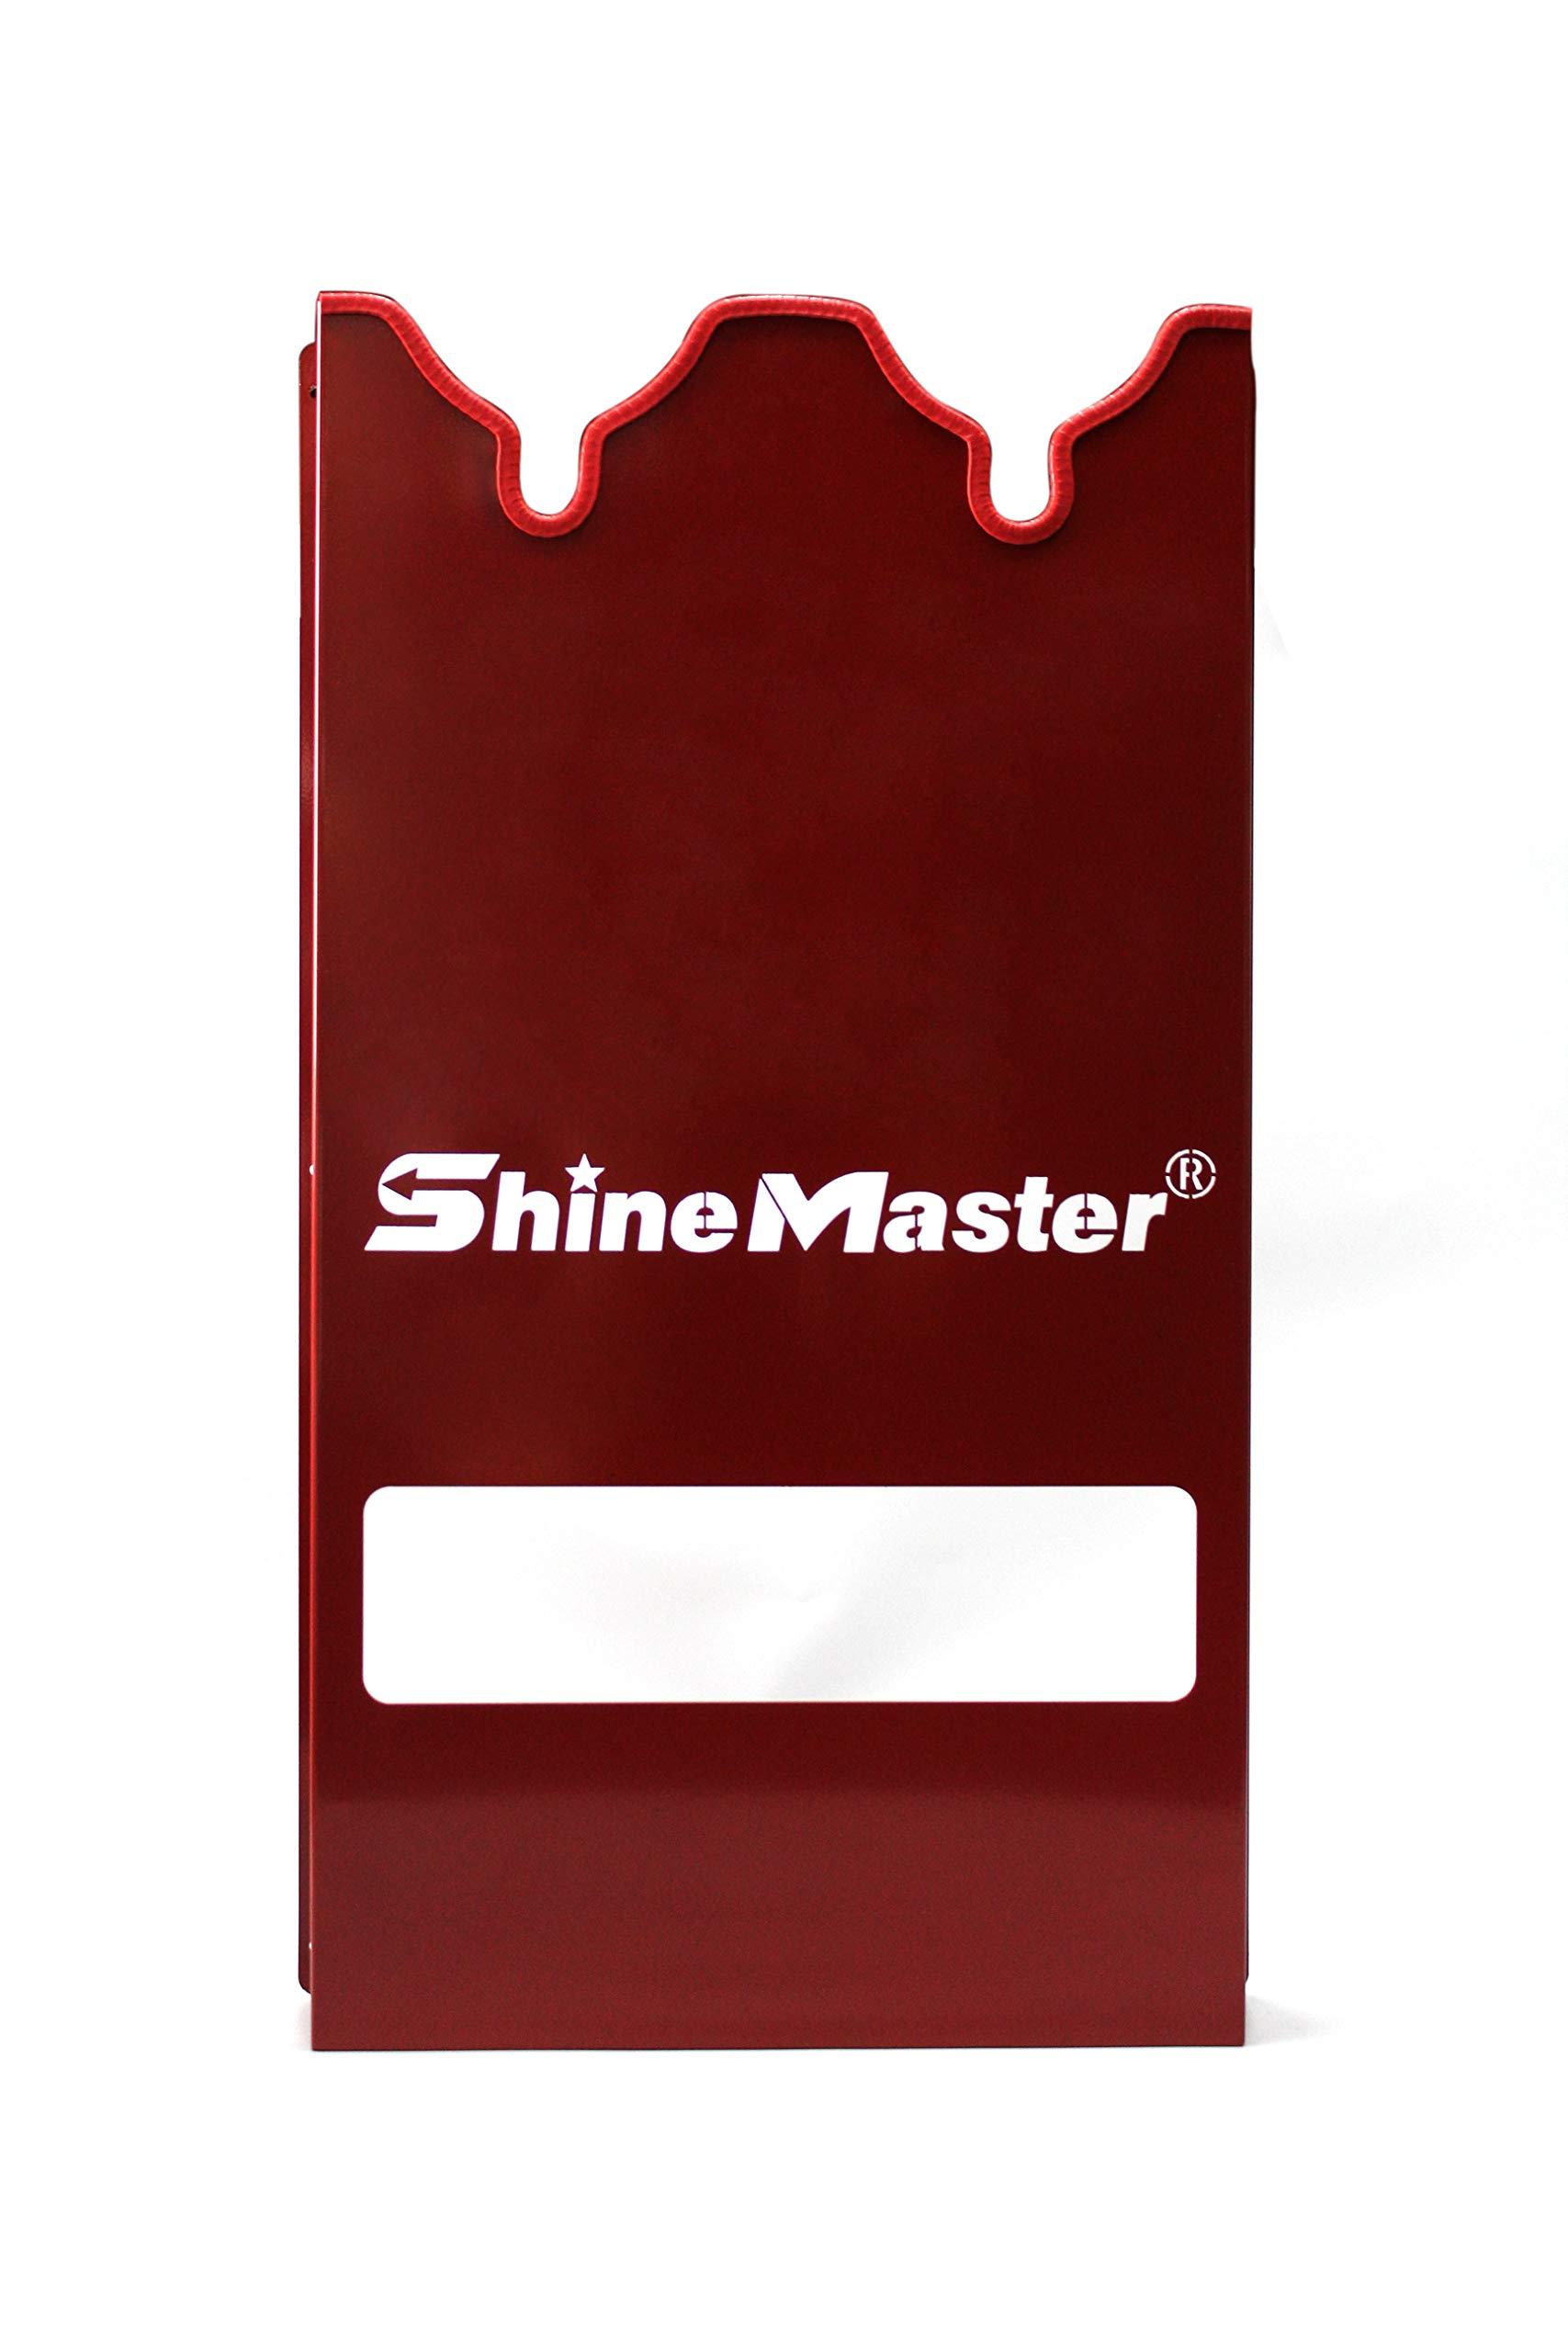 Maxshine Polisher Holder/Rack for Holding The Polisher Double Station Series, Pack of 3 pcs